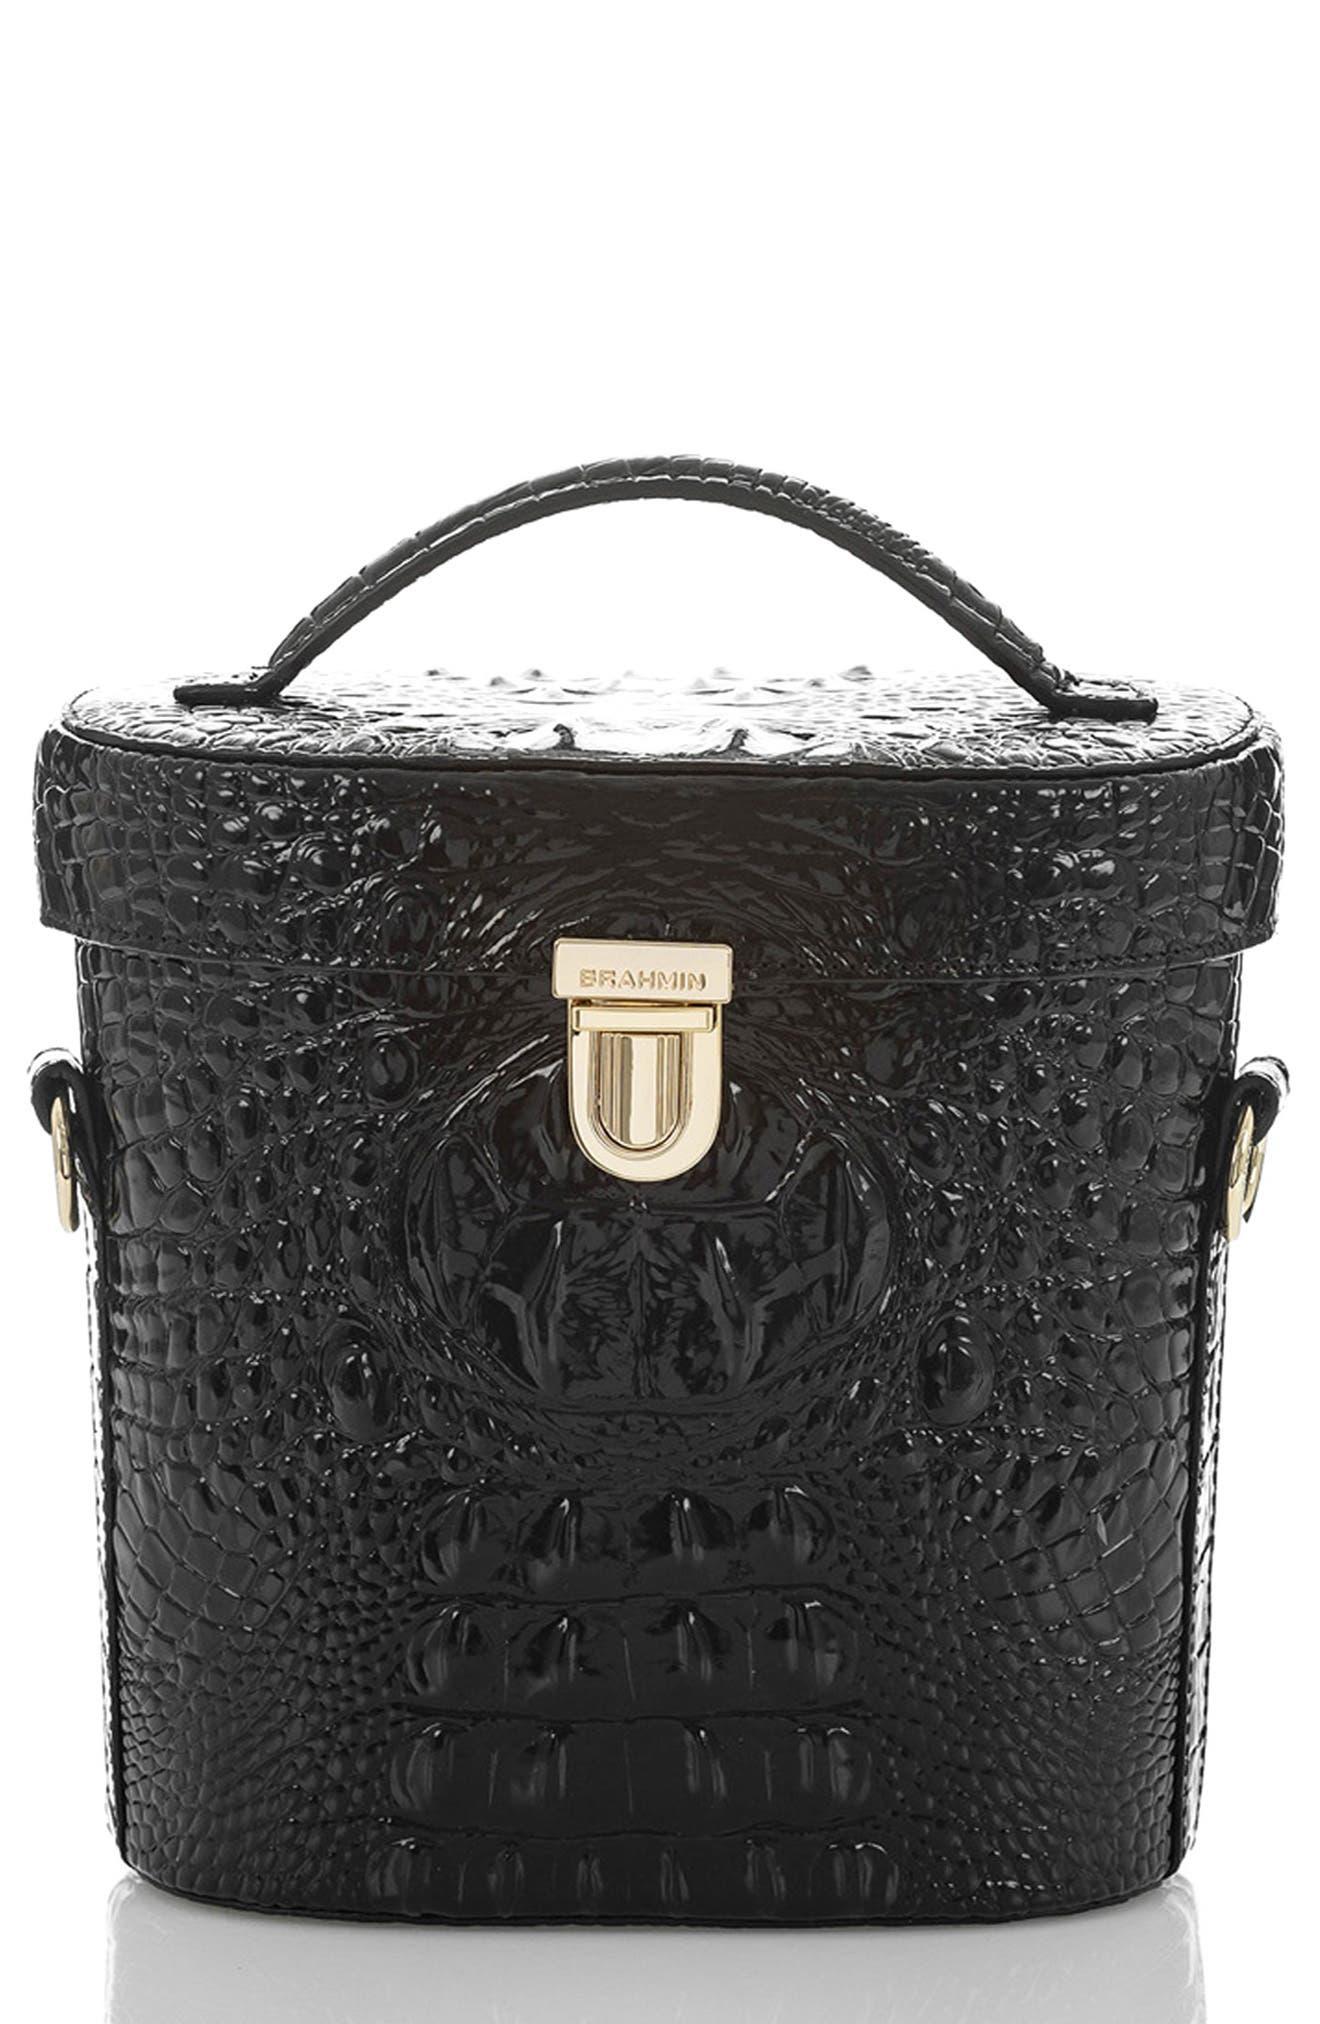 BRAHMIN Pipp Croc Embossed Leather Top Handle Bag, Main, color, BLACK MEMBOURNE